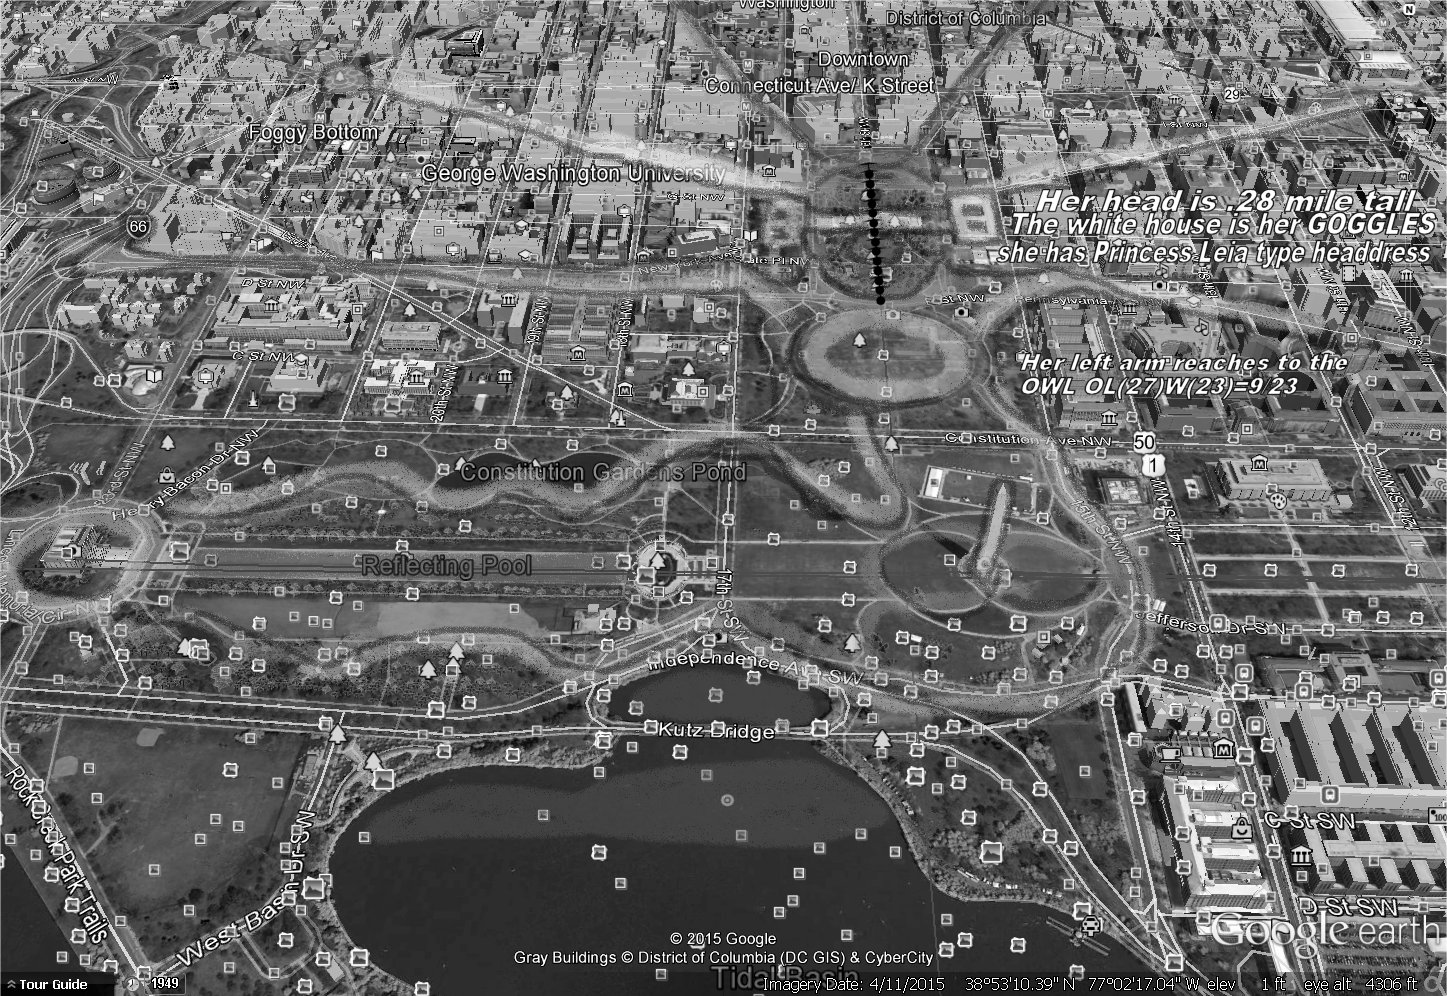 Records Of The Grand Historian Viral Our LADY ISIS Of Washington - Washington dc pyramid map